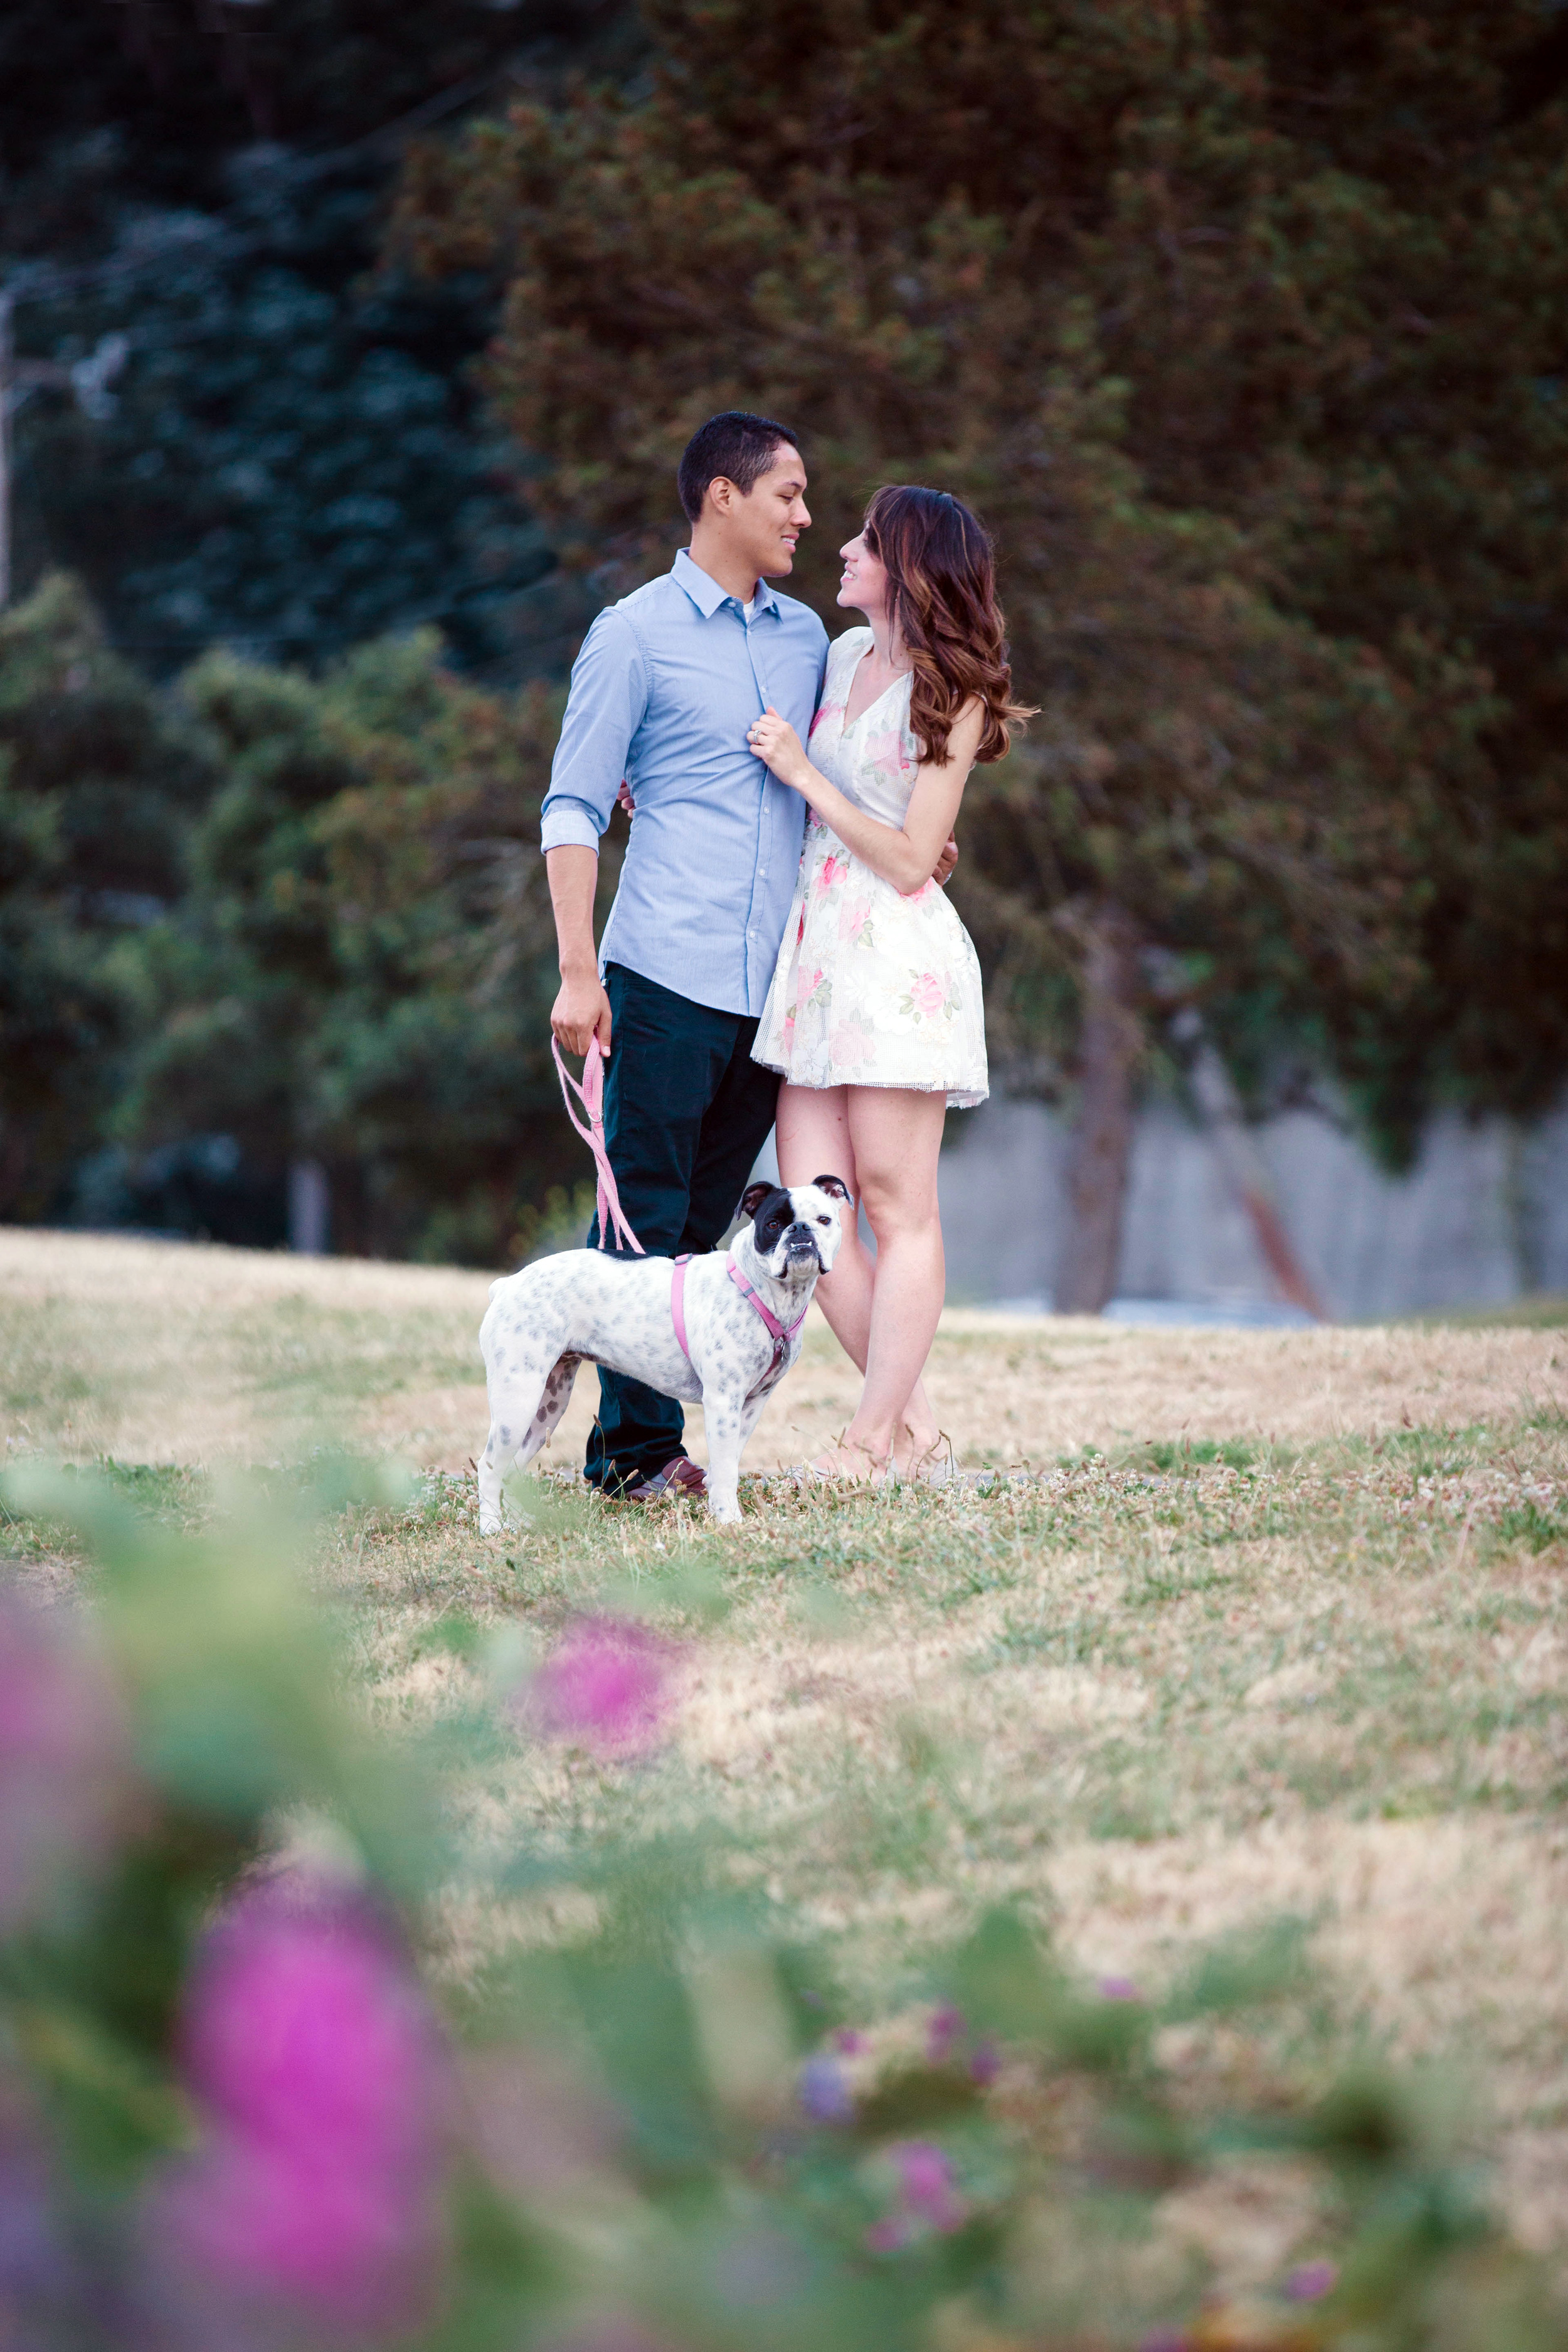 Cruz+Robert ©2015AdinaPrestonPhotography-Seattle+Photographer+Engagement-Weddings-55.jpg